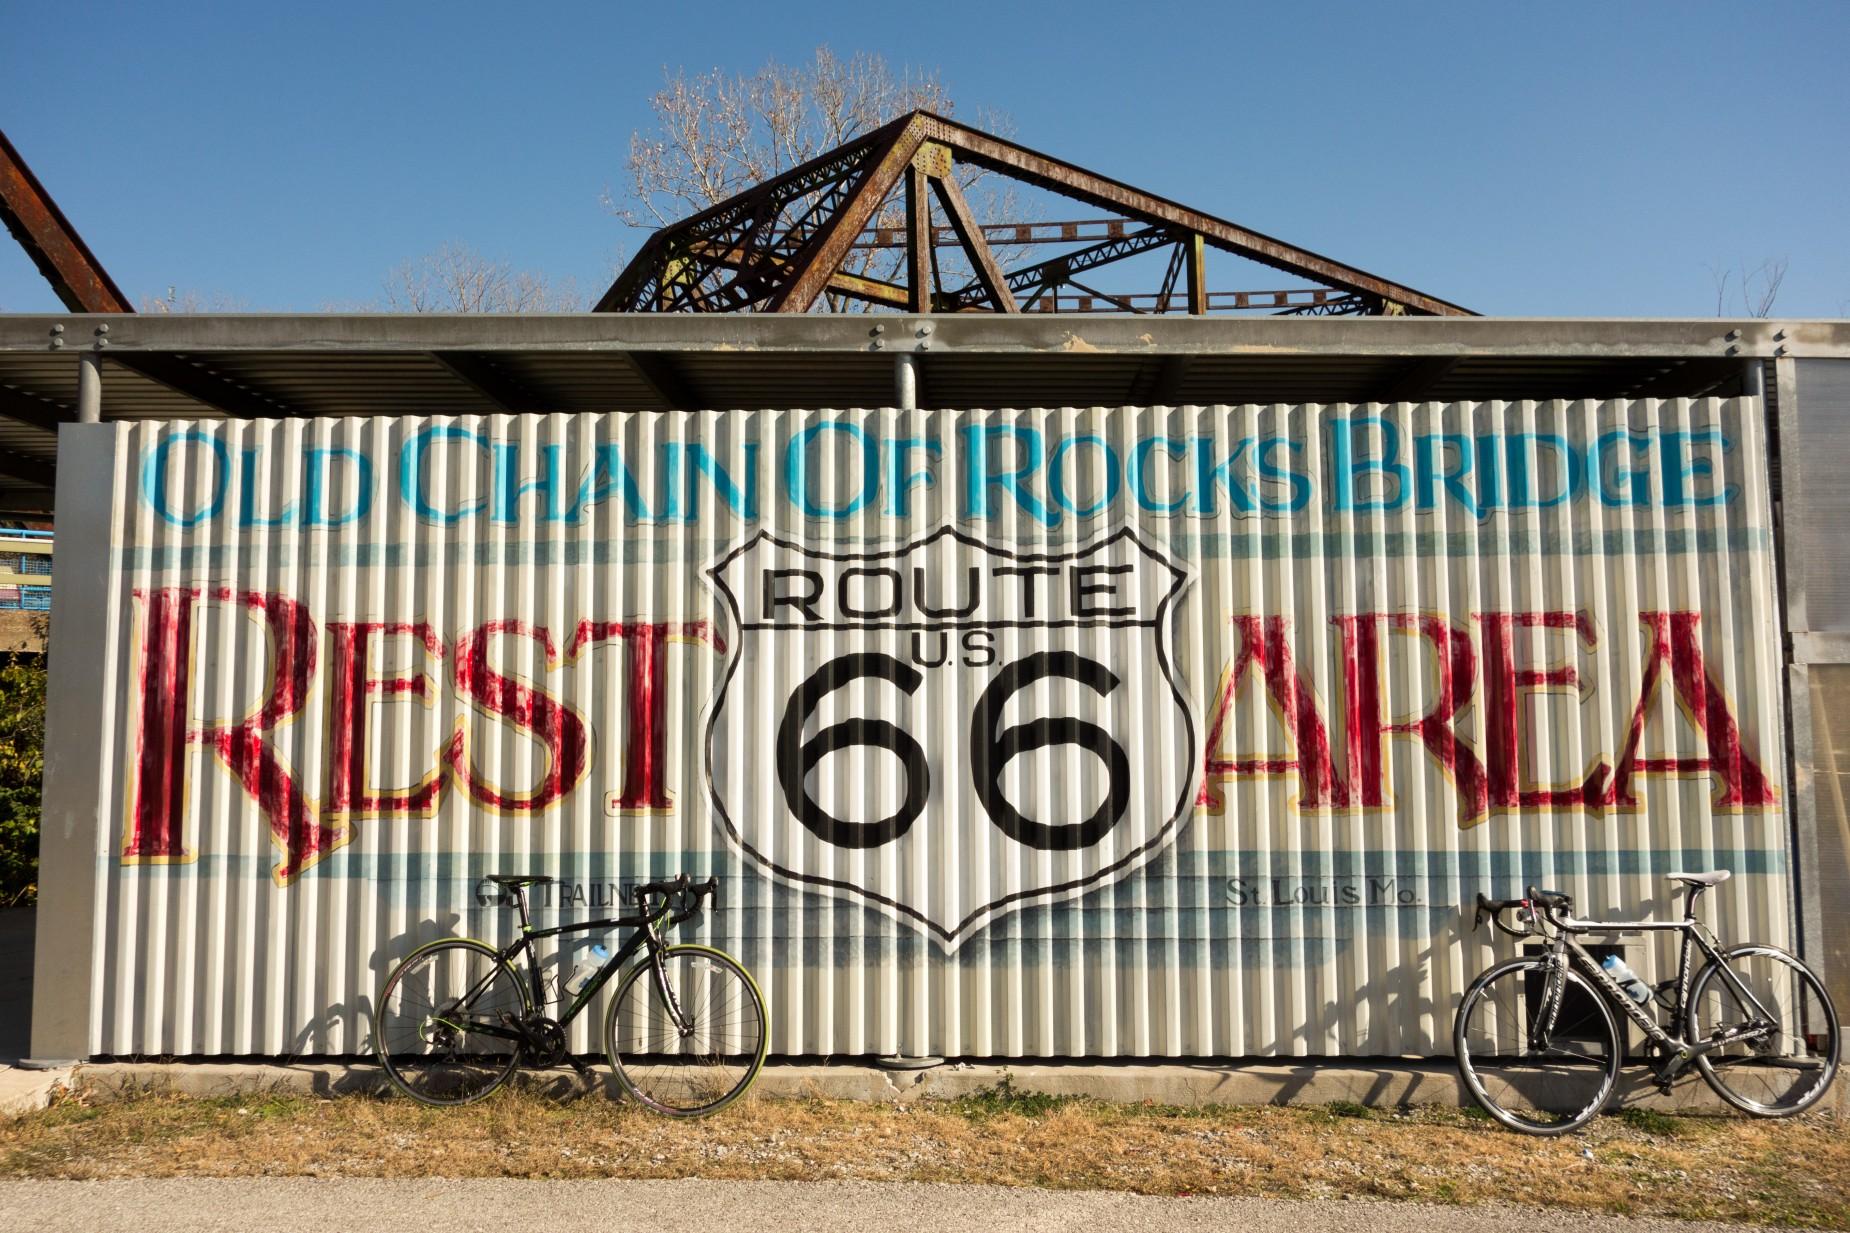 St-Louis-Bicycling-Riverview-Trail-28-1850x1233.jpg